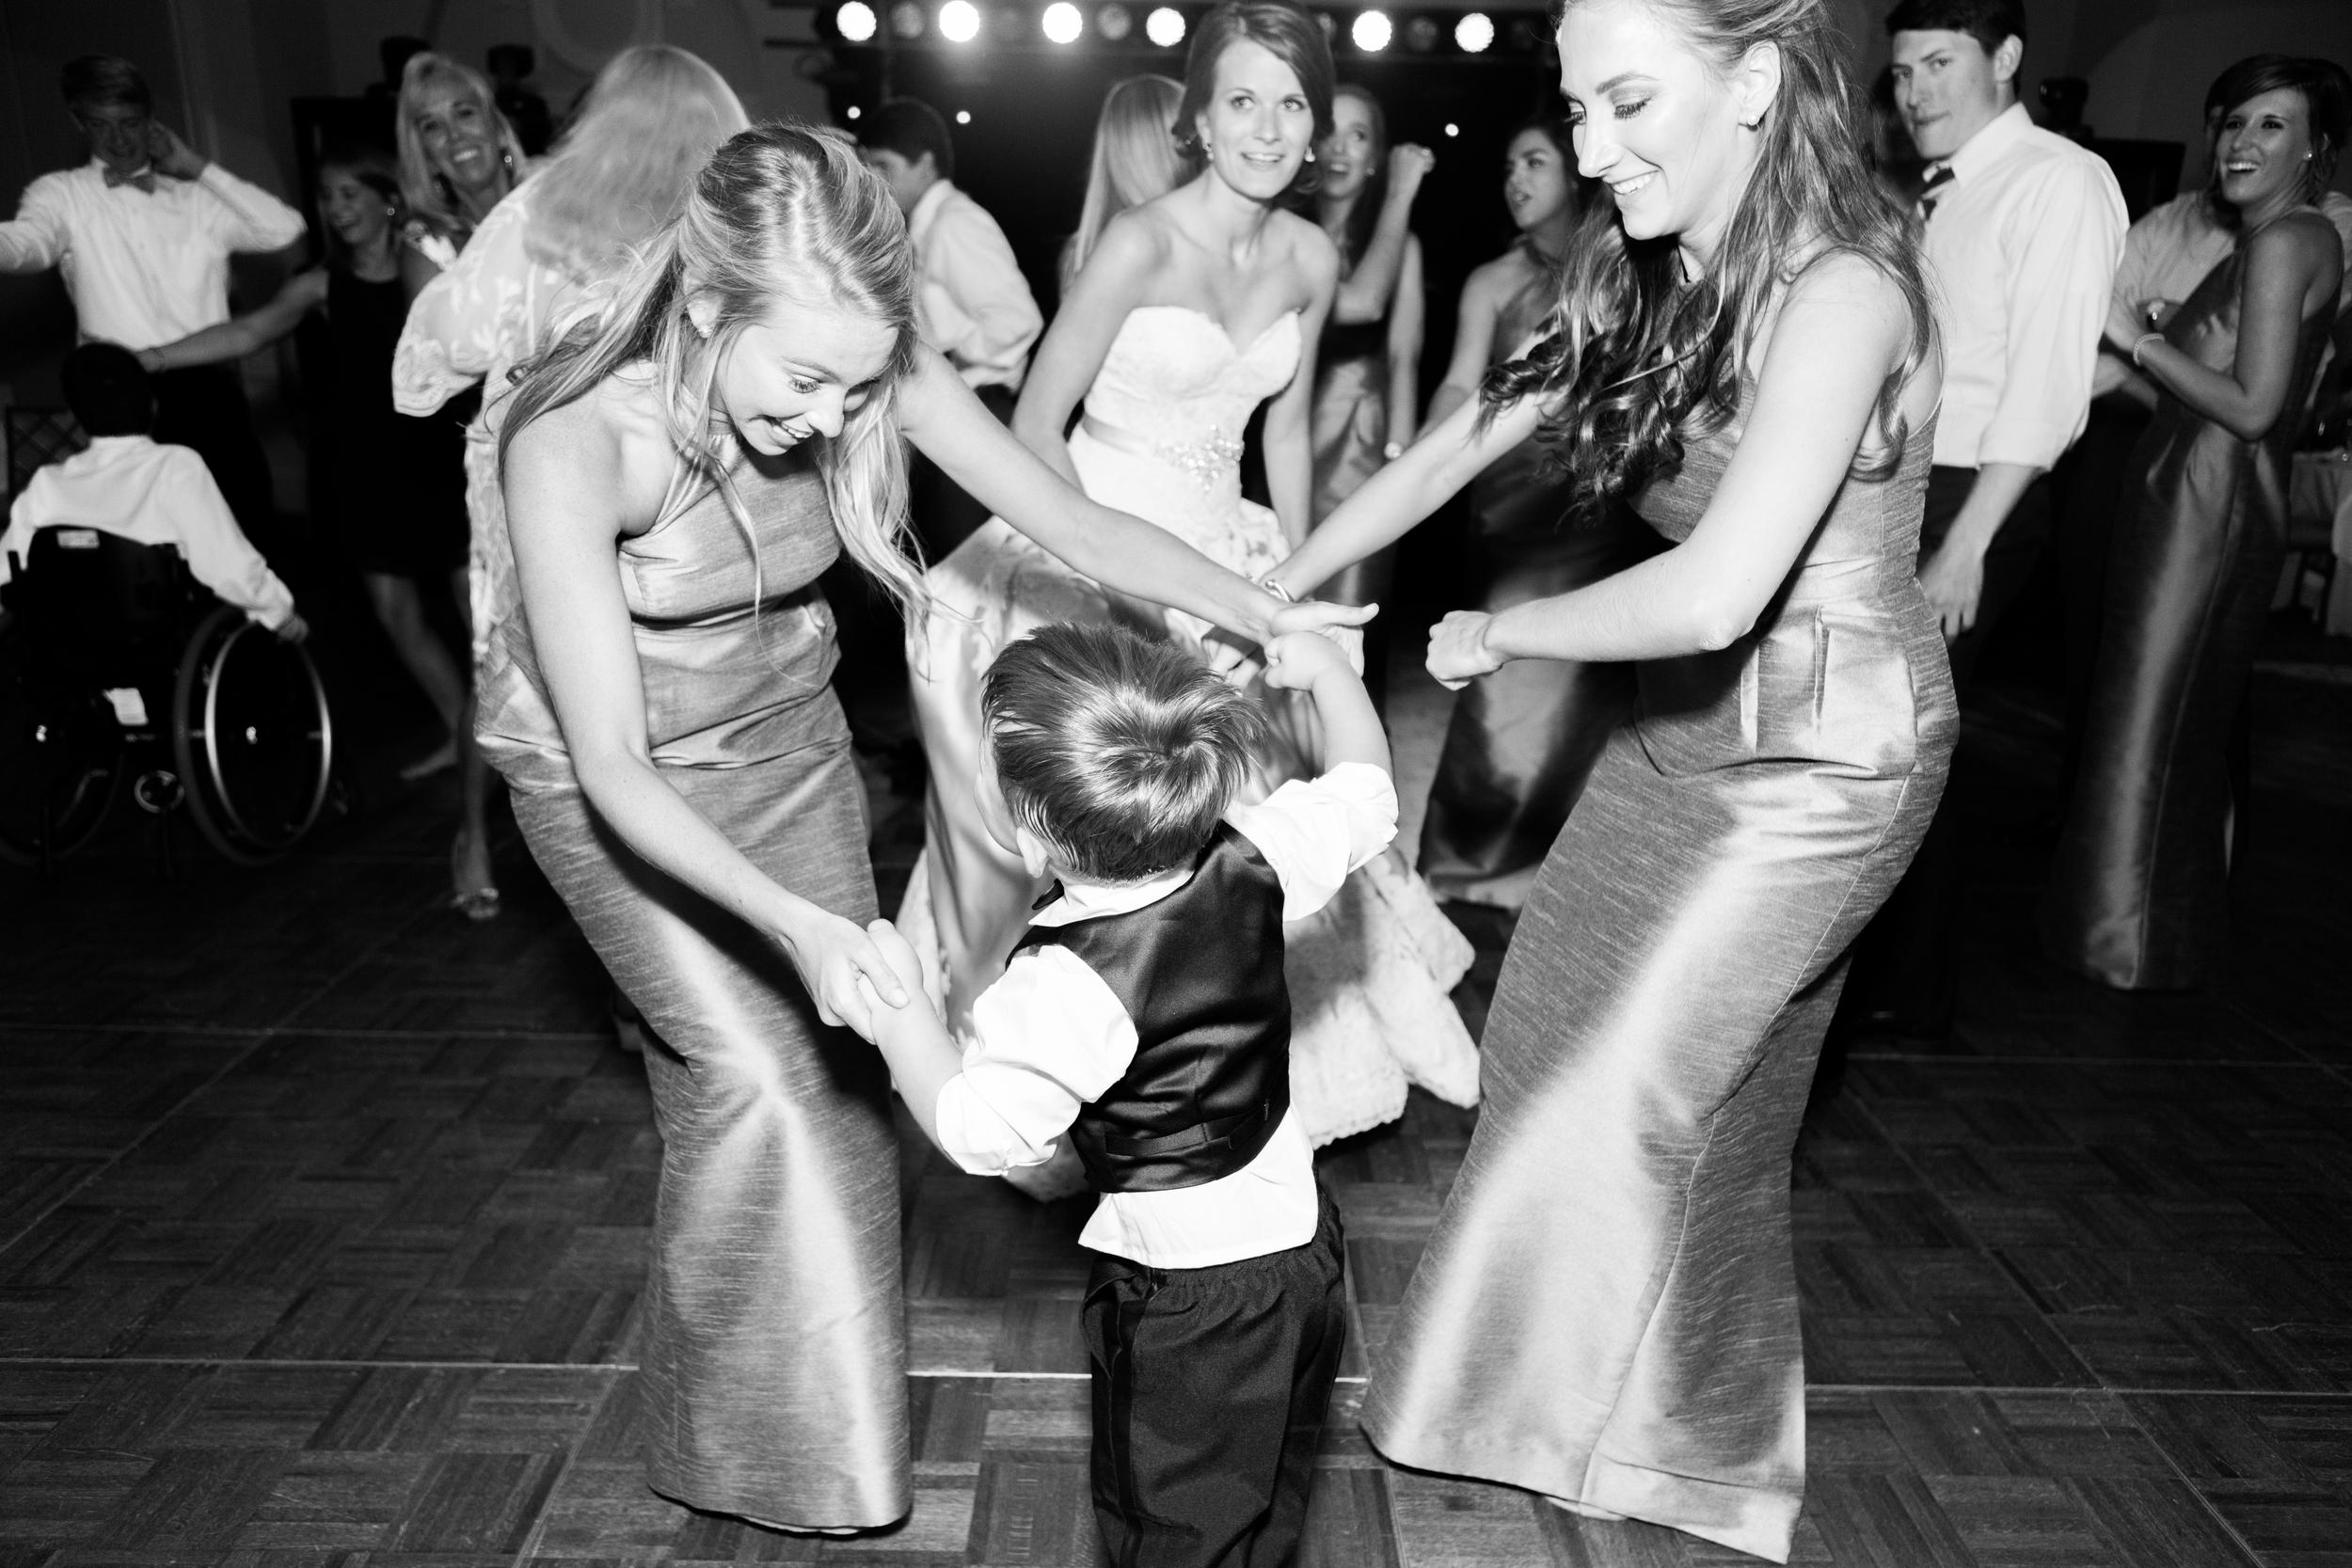 Brewbaker-Wedding-Montgomery-Alabama-Nick-Drollette-139.jpg